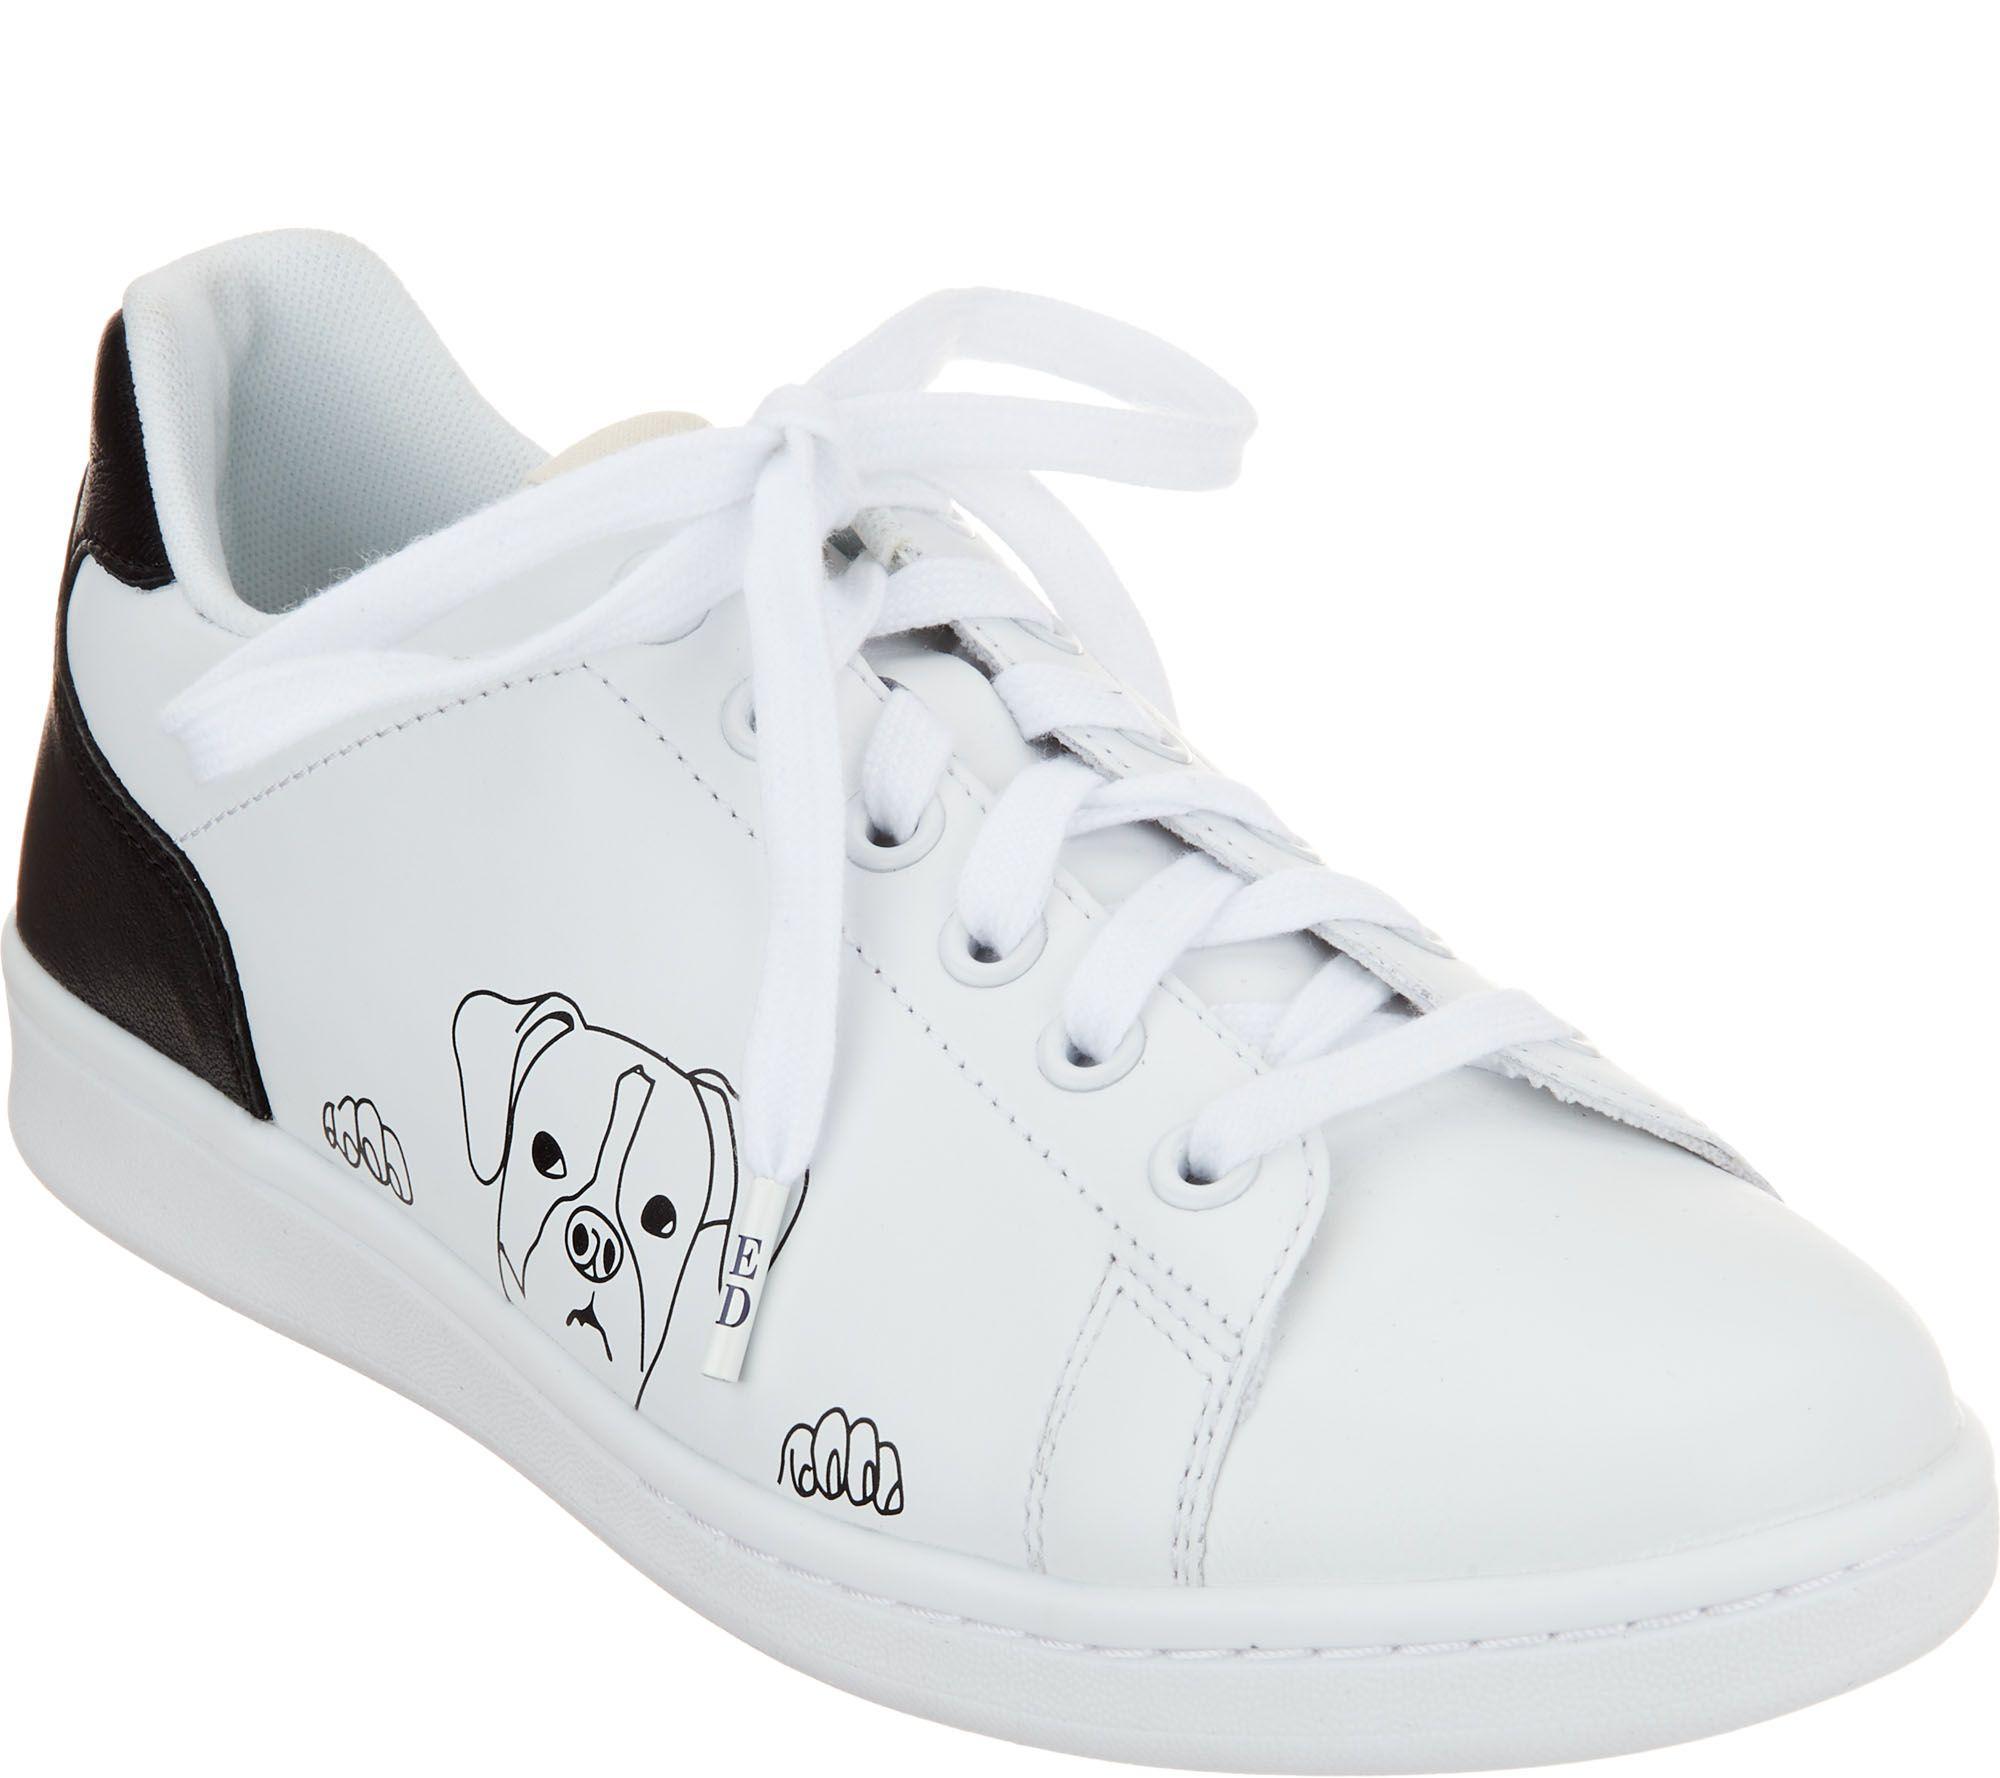 ED Ellen DeGeneres Leather Graphic Sneakers - Chapanima - A293770